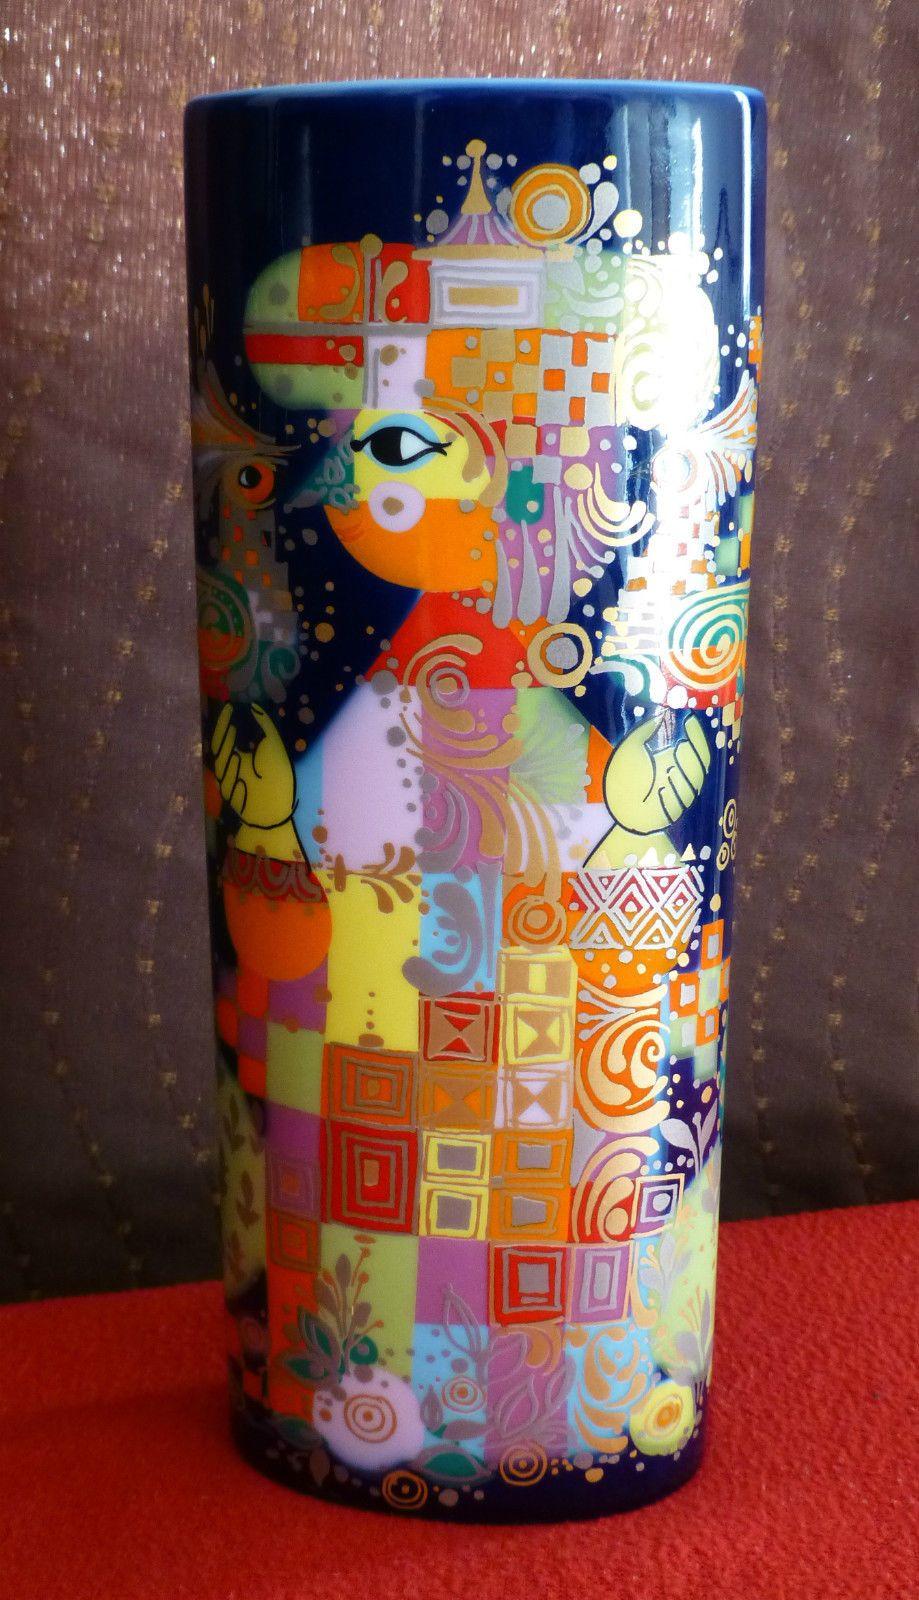 ROSENTHAL 1001 Nacht (1001 Nights) Vase - Björn Wiinblad 8½ Inches ...